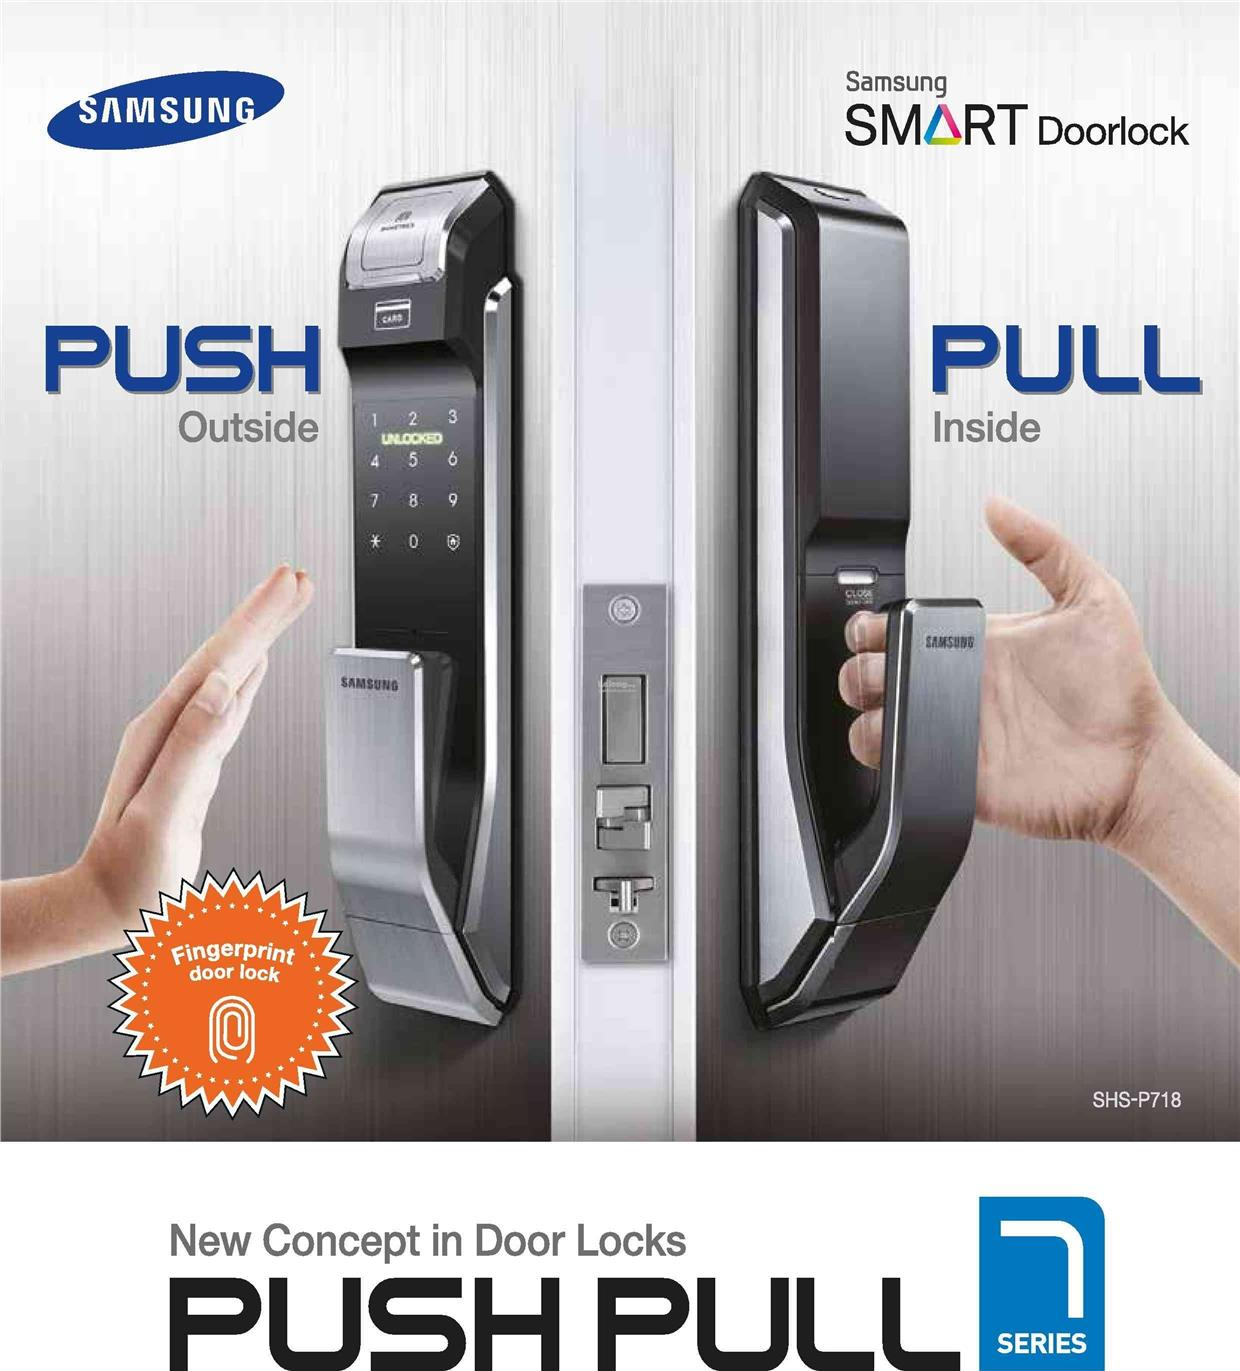 SAMSUNG SHS-P718 PUSHu0026PULL DIGITAL DOOR LOCK  sc 1 st  Lelong.my & SAMSUNG SHS-P718 PUSHu0026PULL DIGITAL D (end 3/16/2018 2:53 PM) pezcame.com